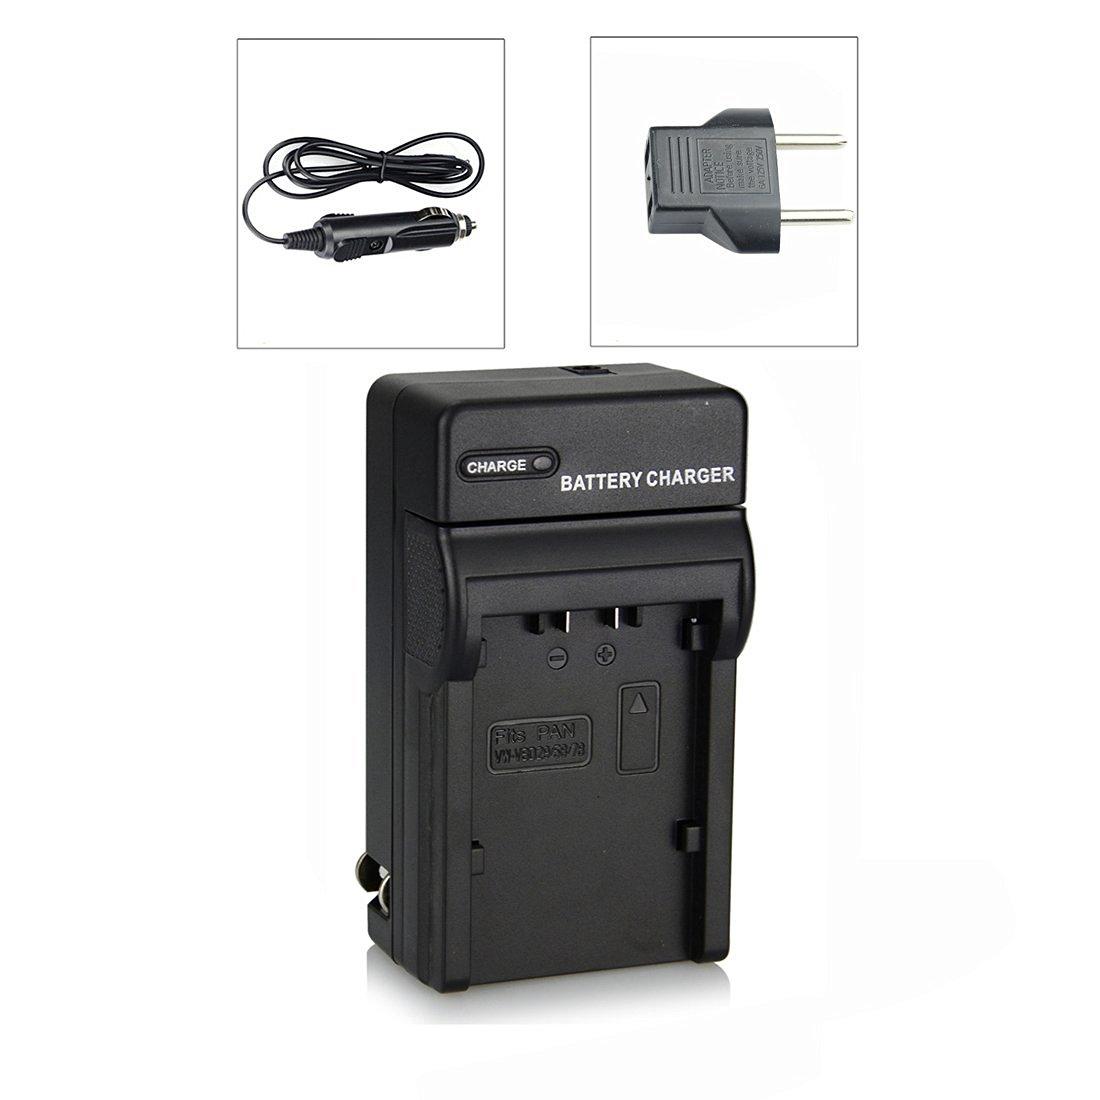 DSTE DC155 Travel and Car Charger Adapter for Panasonic VW-VBD29 VW-VBD58 VW-VBD78 Battery as AG-B23P